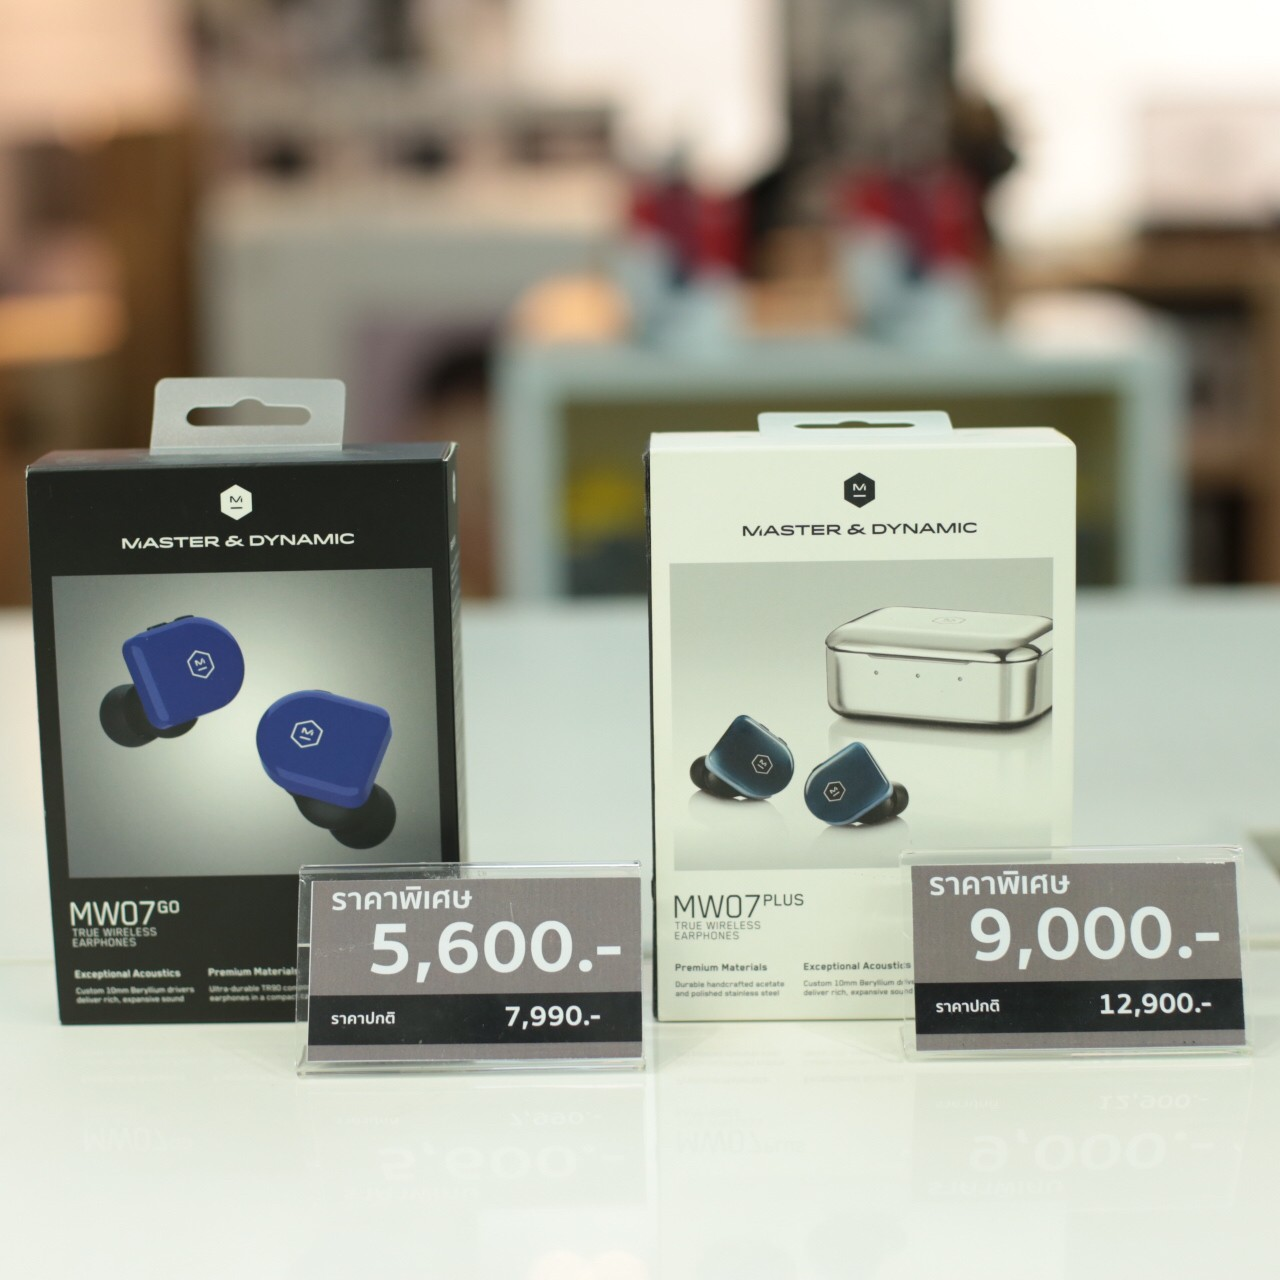 Pic_Master & Dynamic หูฟังไร้สาย รุ่น MW07 GO และ Master & Dynamic หูฟังไร้สาย รุ่น MW07 Plus